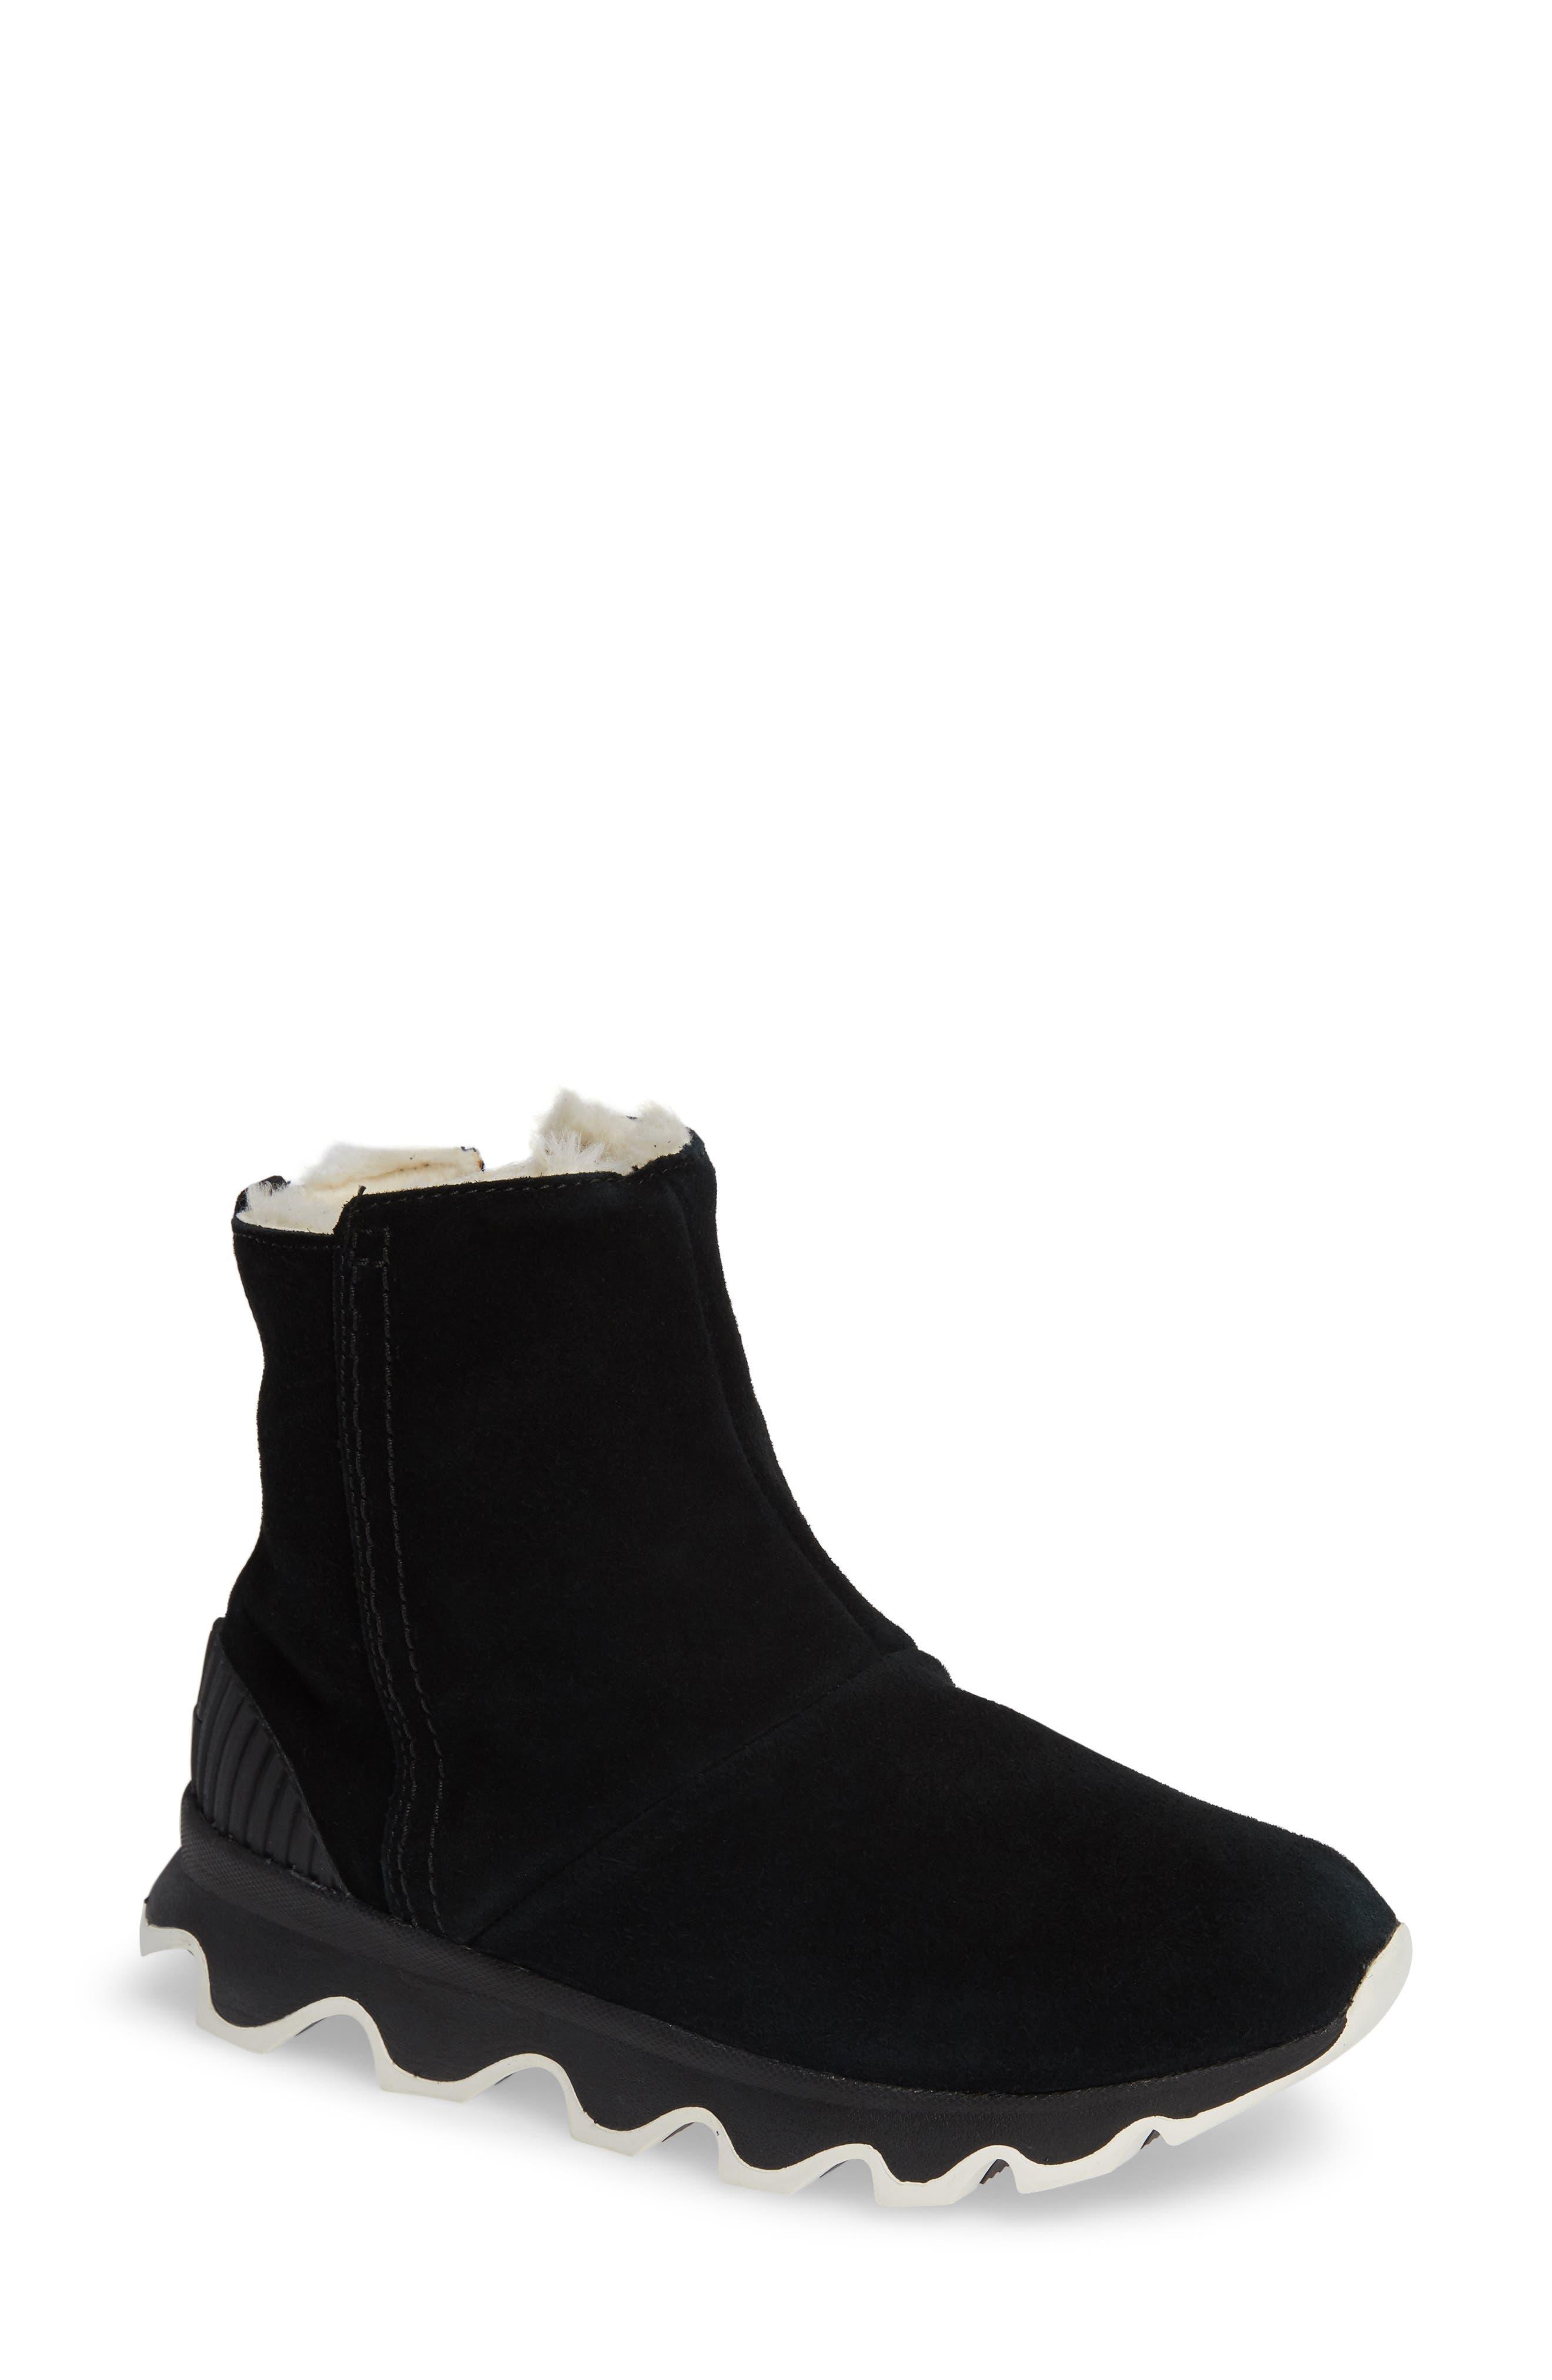 Kinetic Insulated Waterproof Short Boots,                             Main thumbnail 1, color,                             BLACK/ SEA SALT